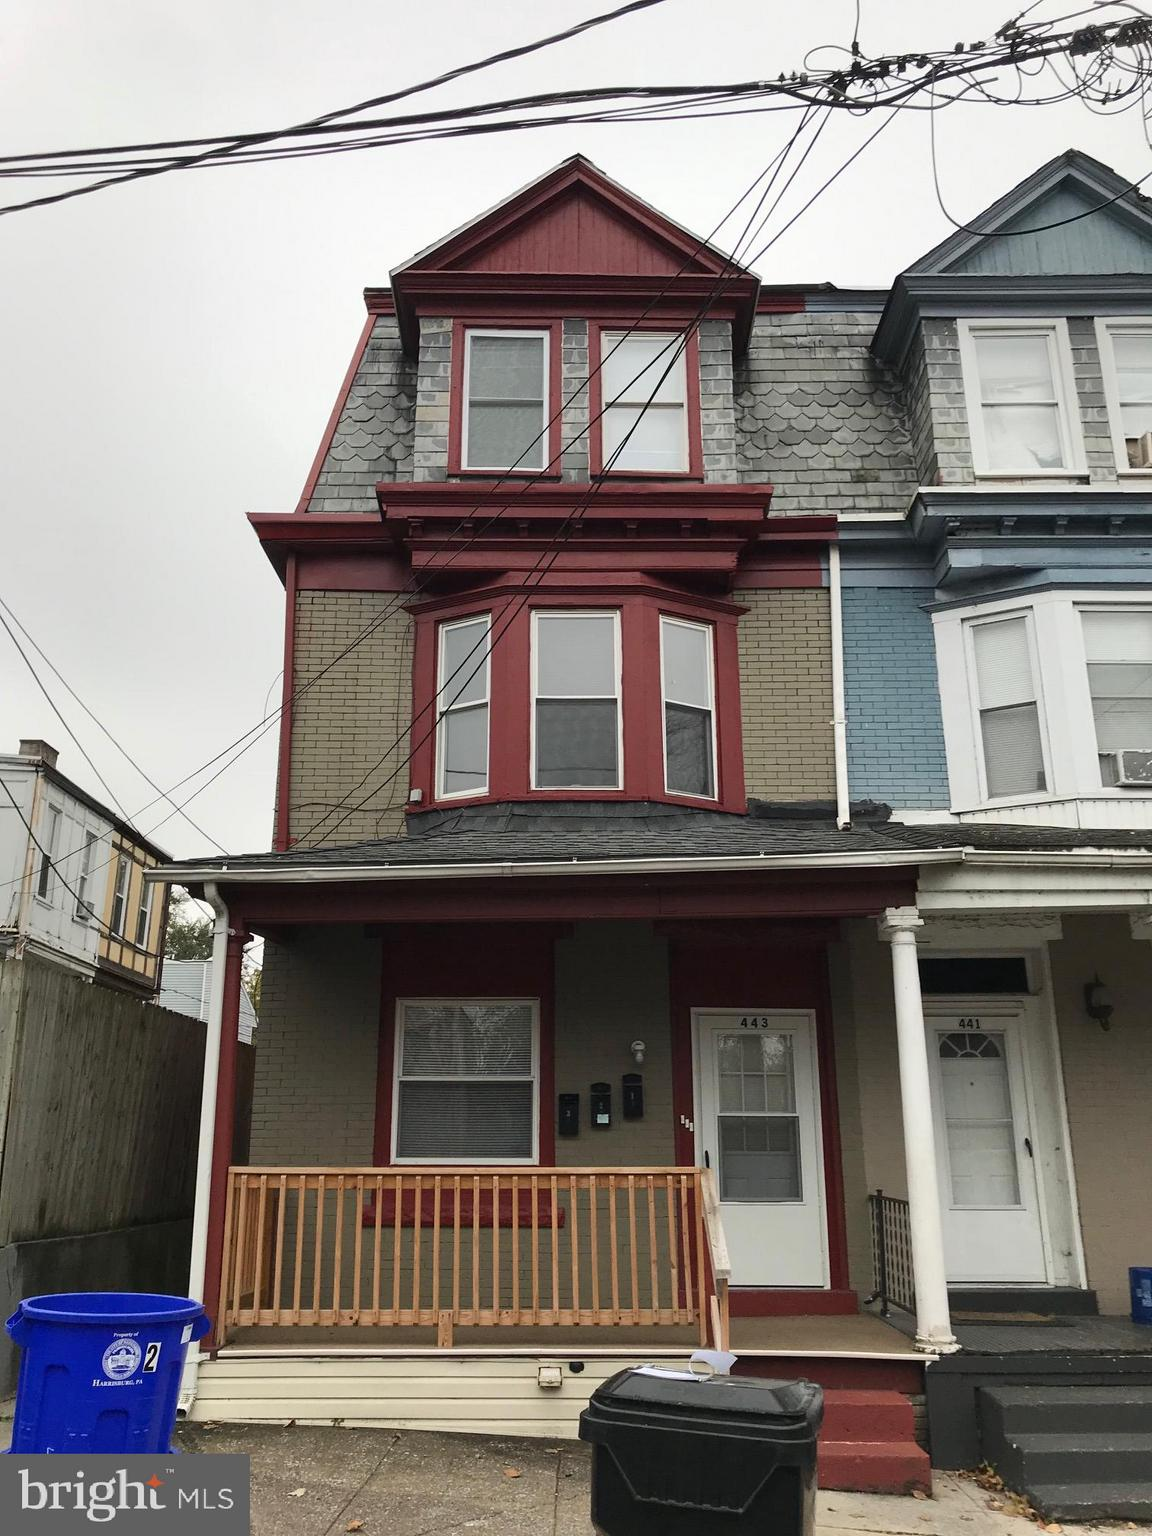 443 HARRIS STREET, HARRISBURG, PA 17102